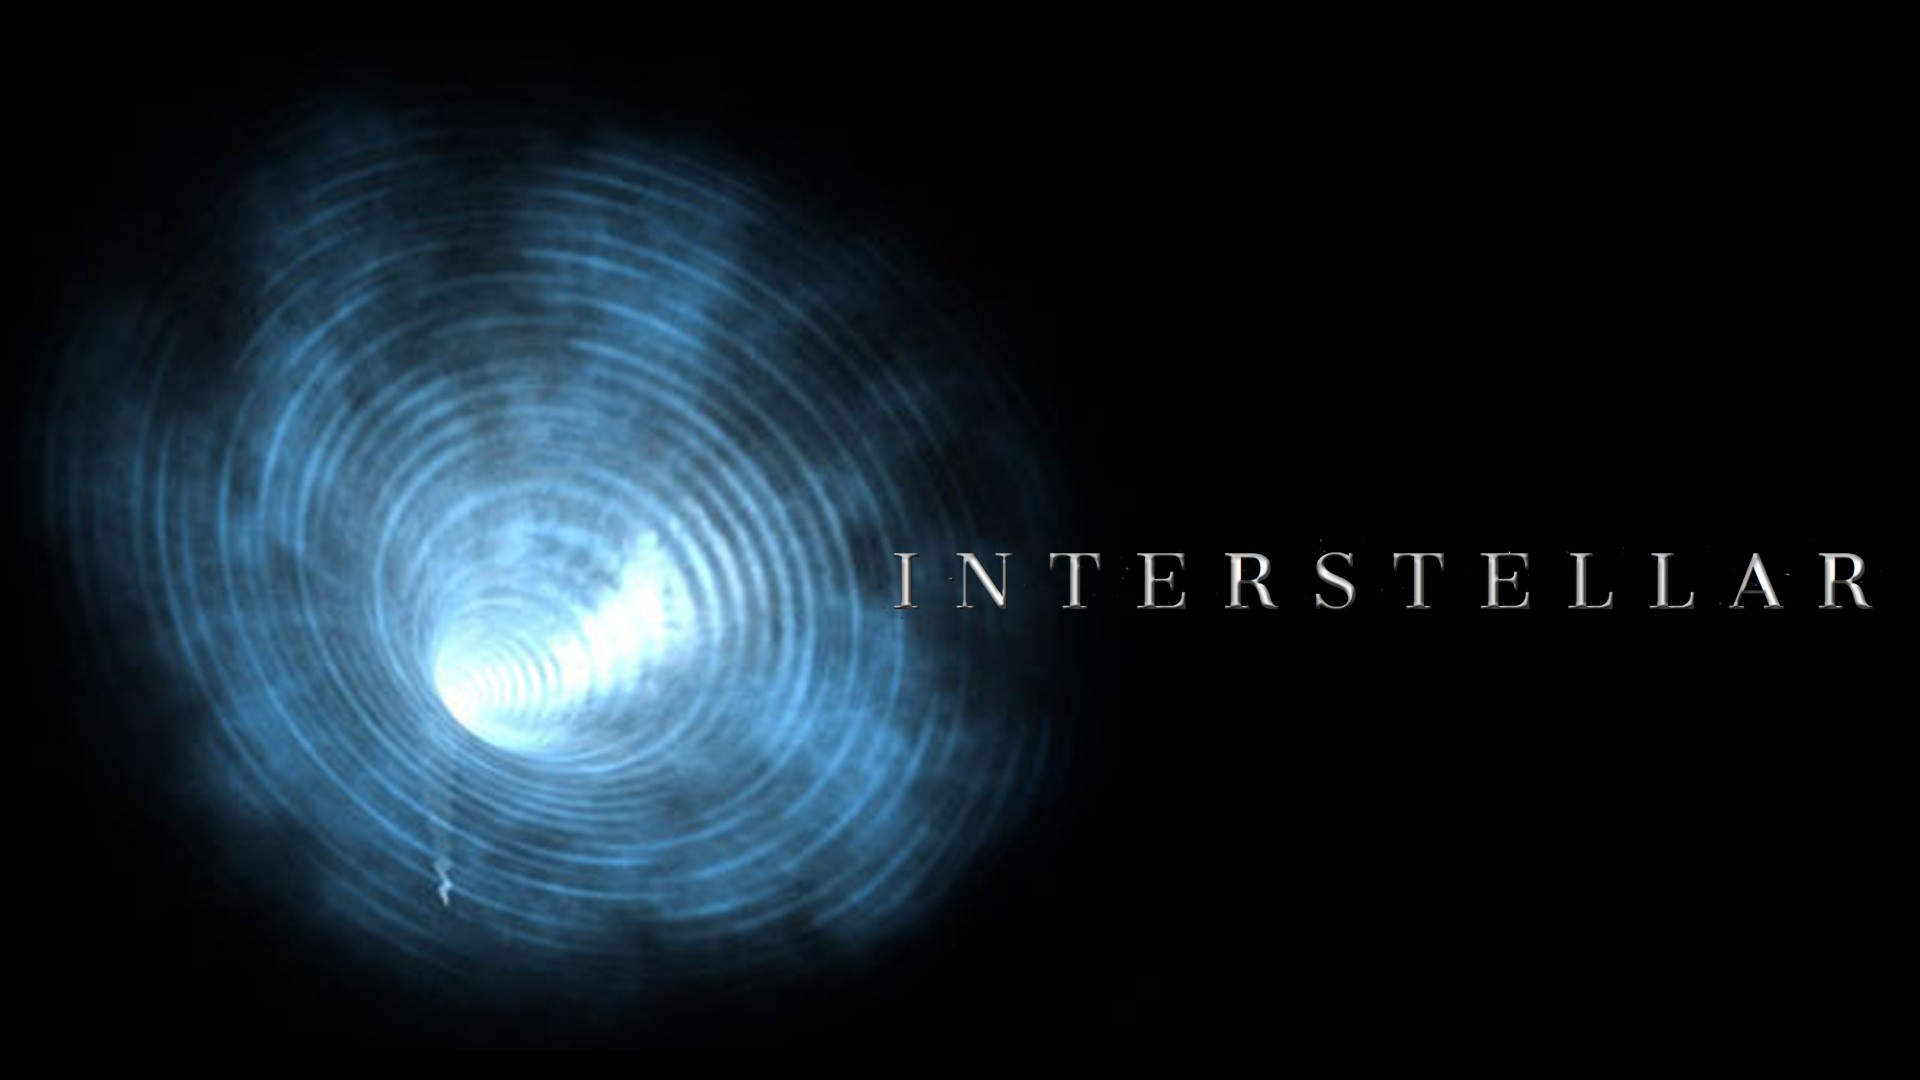 Best Interstellar Wallpapers Download 1091929 Hd Wallpaper Backgrounds Download